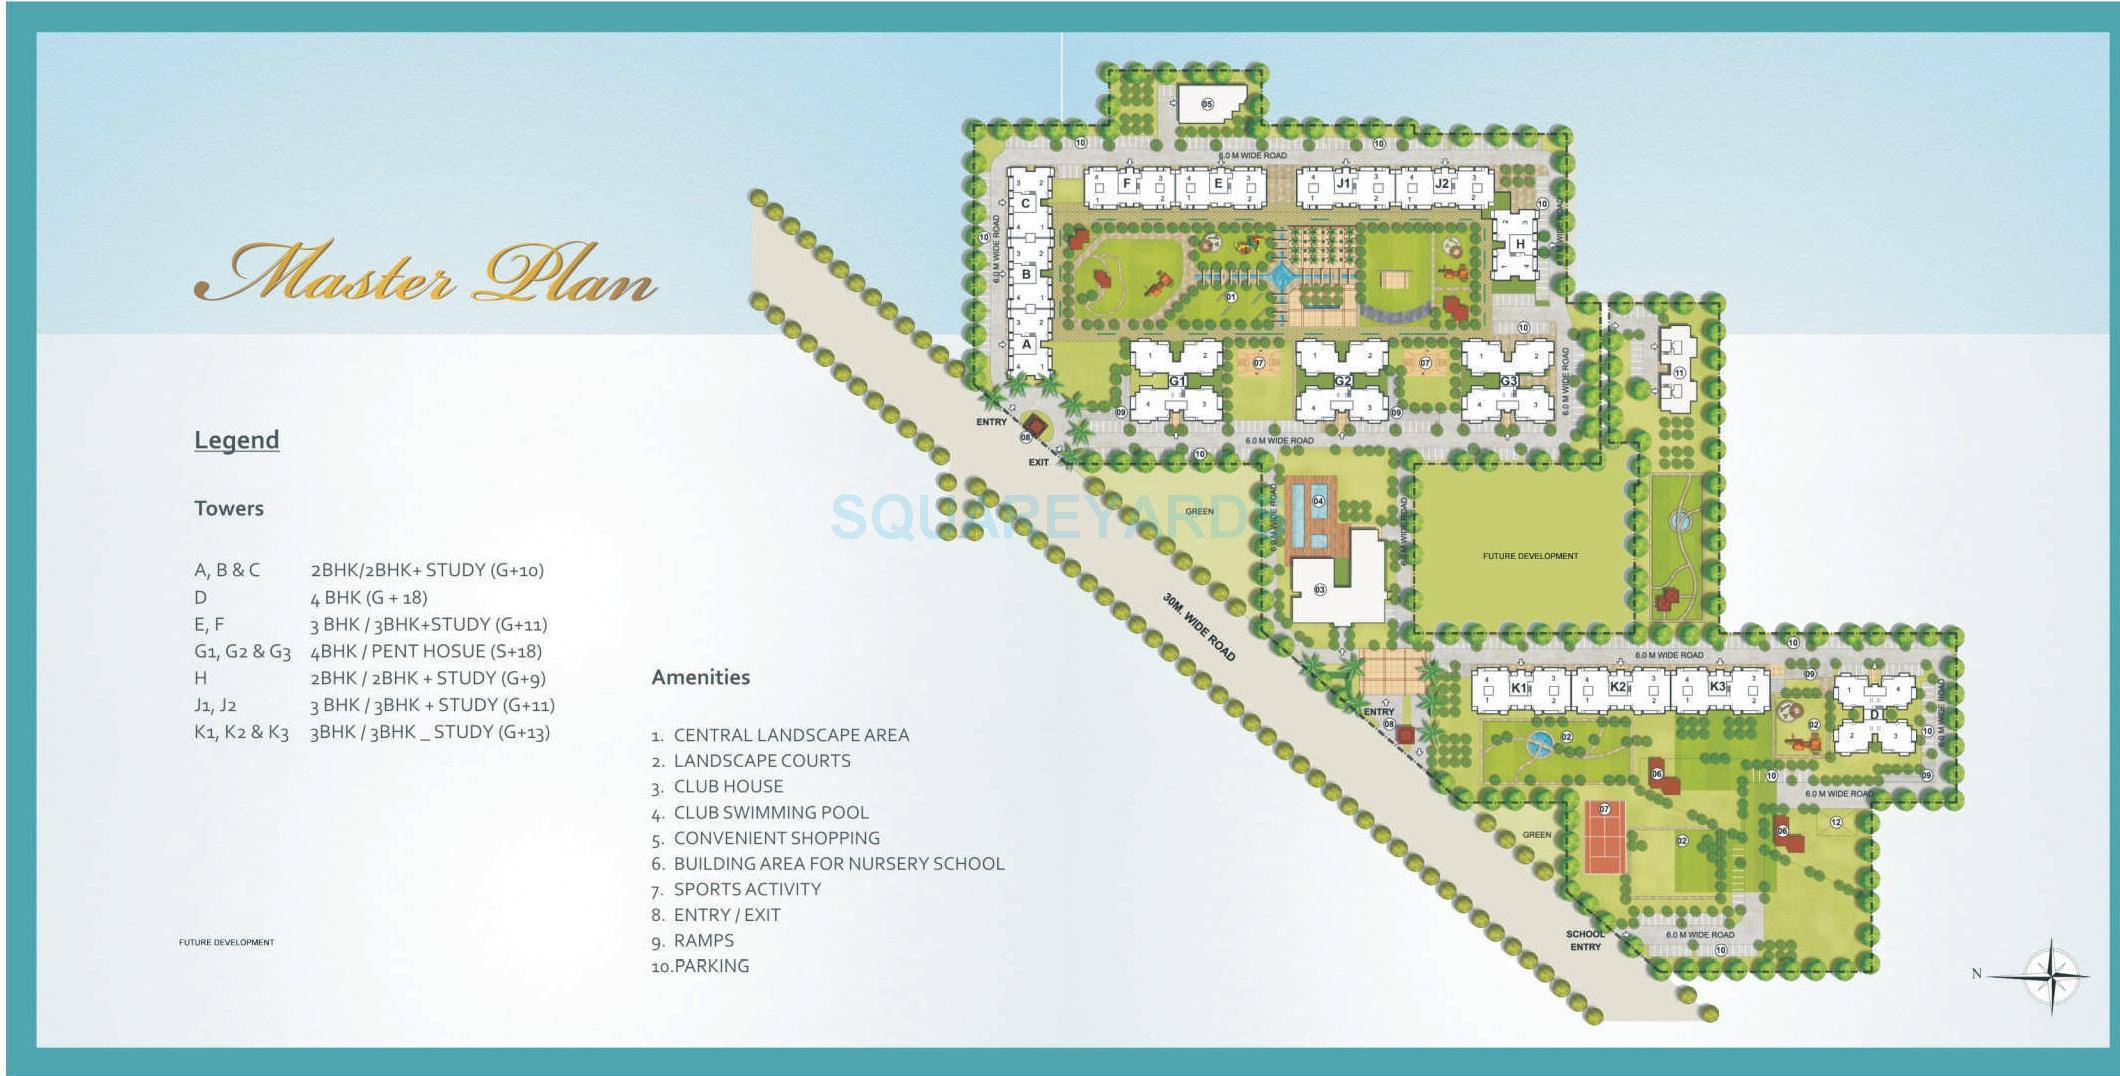 indiabulls centrum park master plan image1